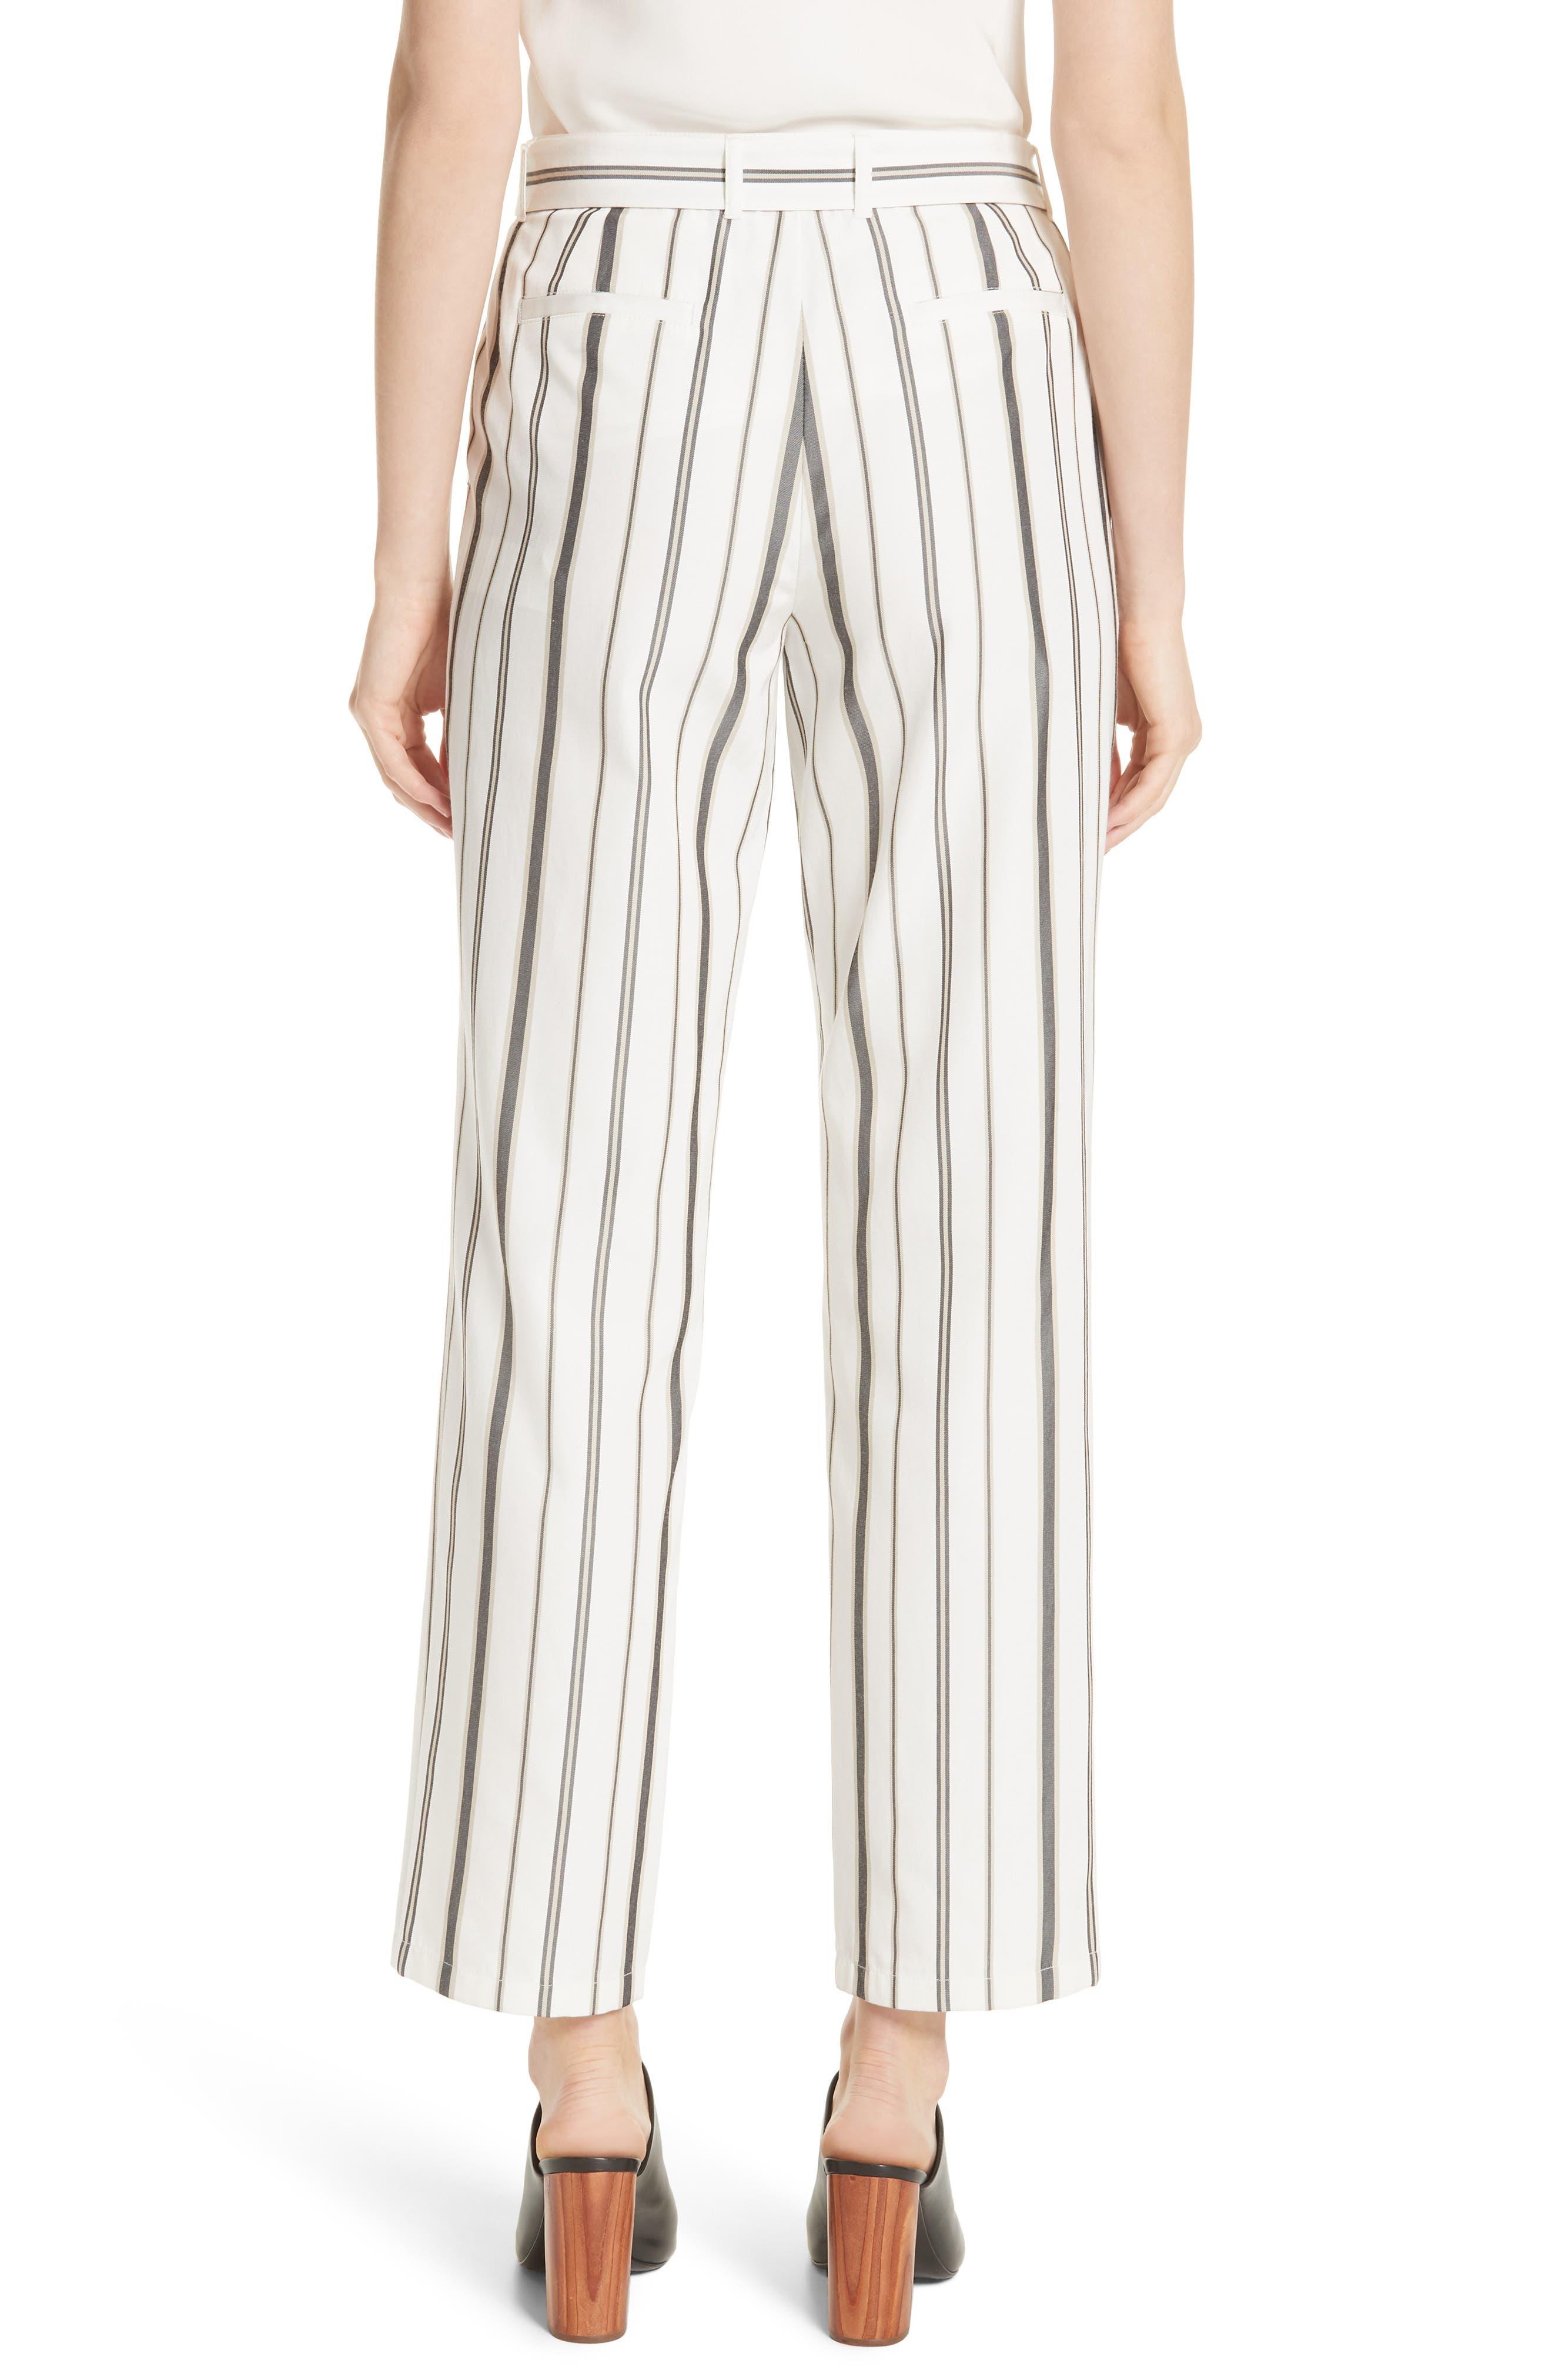 Fulton Gallant Stripe Pants,                             Alternate thumbnail 2, color,                             CLOUD MULTI